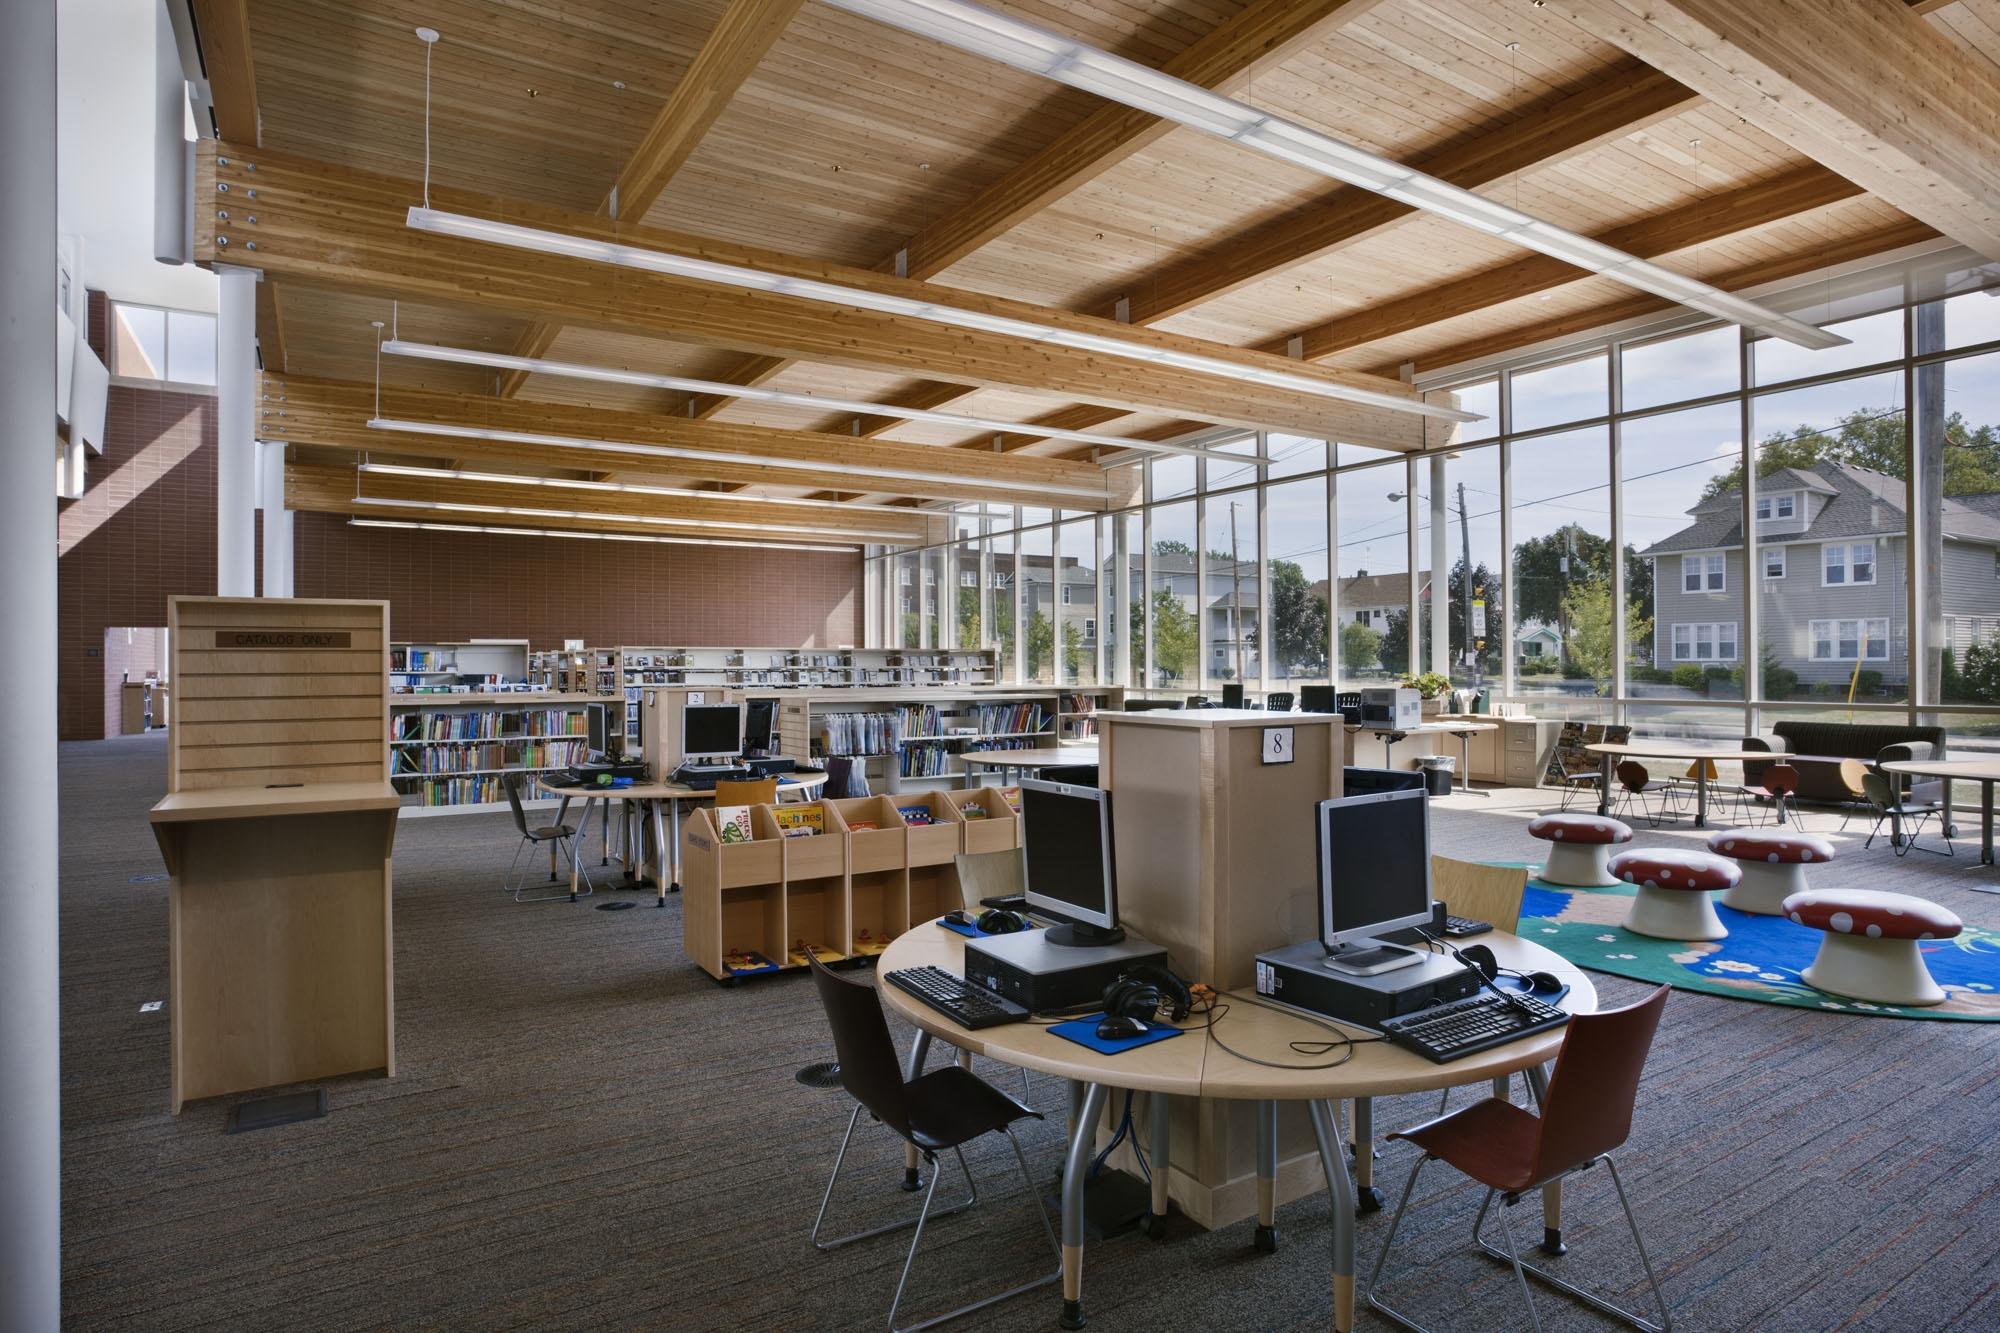 Cleveland Public LibraryRice Branch - Cleveland, Ohio